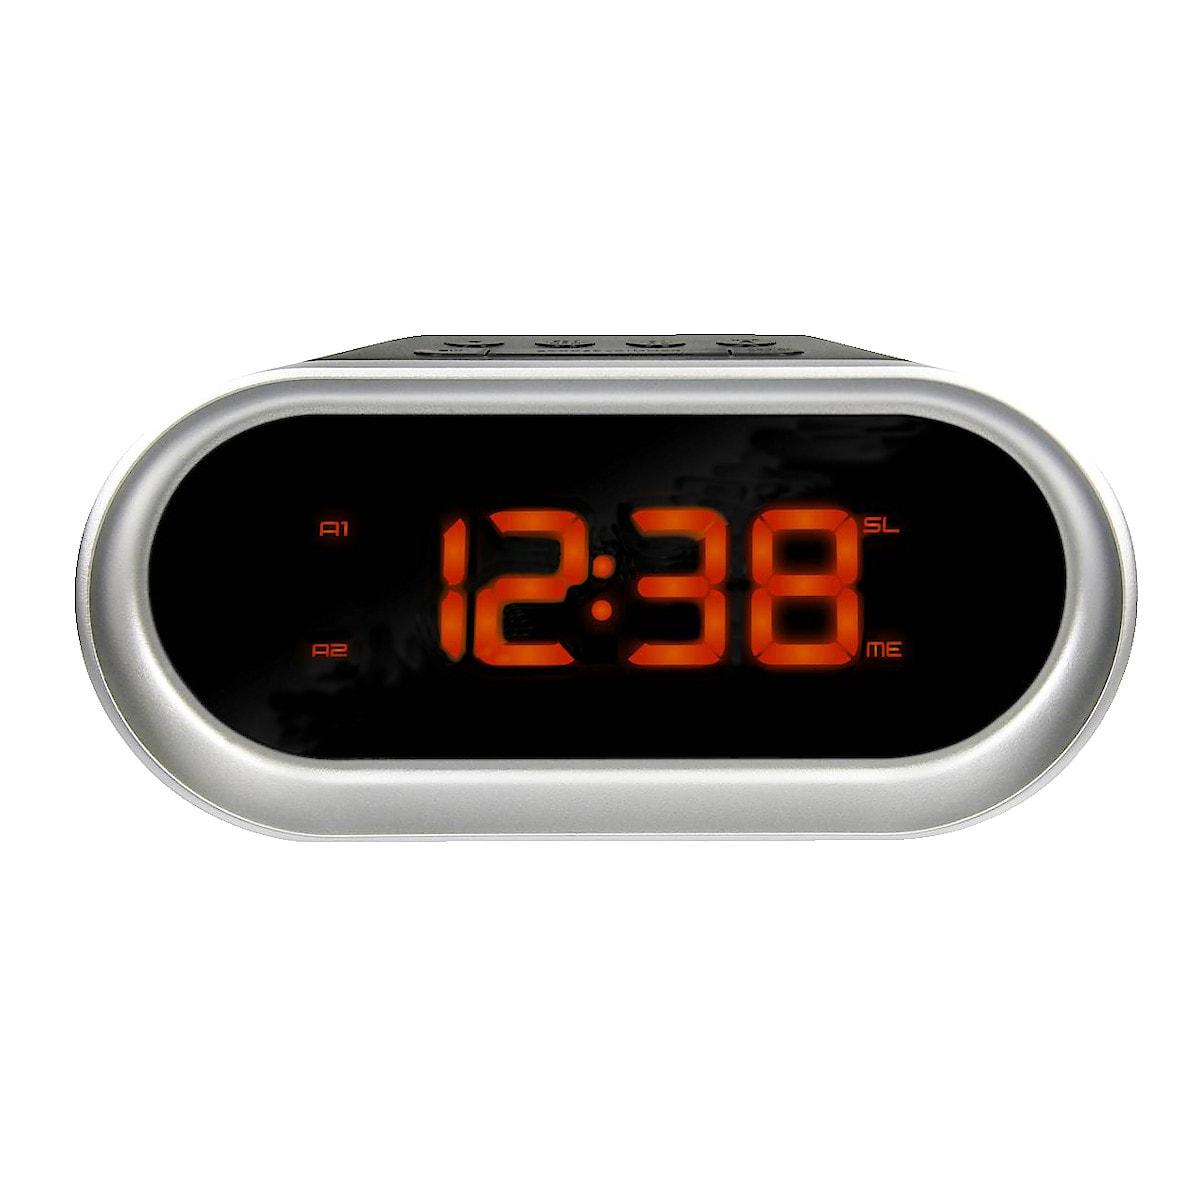 Clock Radio with Dual Alarm, silver